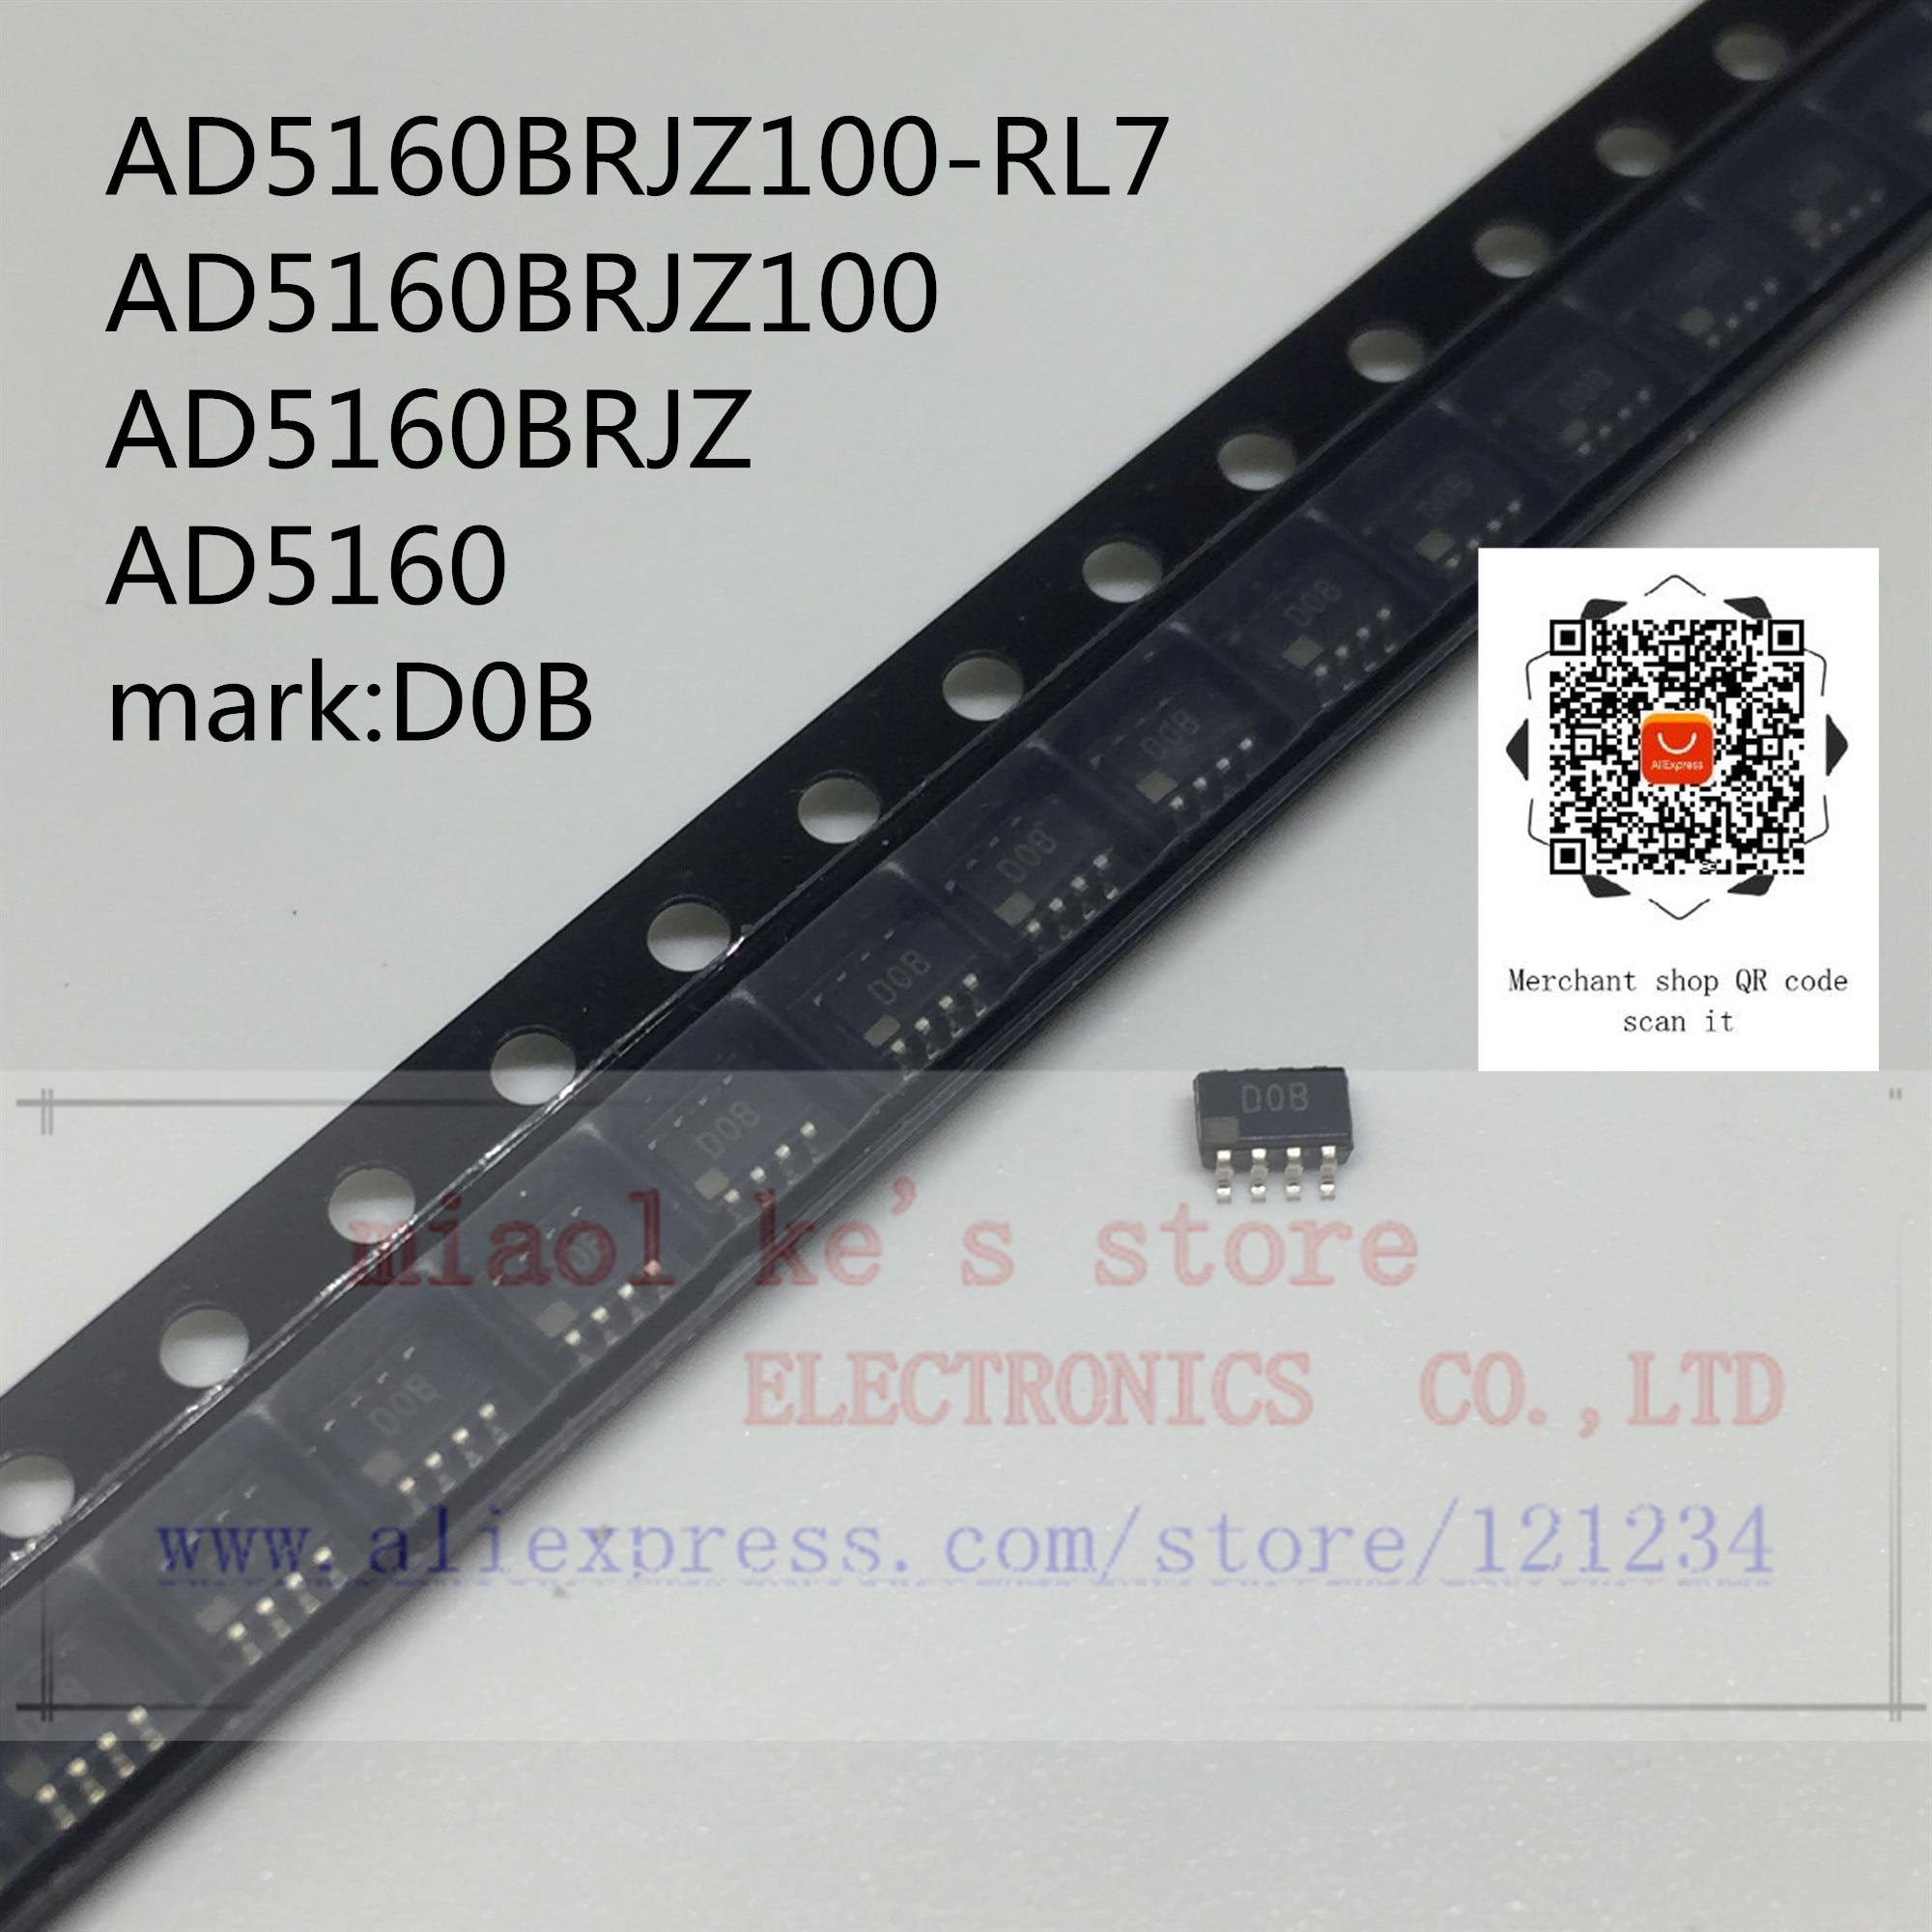 (5 uds ~ 10 uds) 100% nuevo original; AD5160BRJZ100-RL7 AD5160BRJZ100 AD5160BRJZ AD5160 marca D0B [100k 2,7 V ~ 5,5 V]-IC olla DGTL SPI 256POS